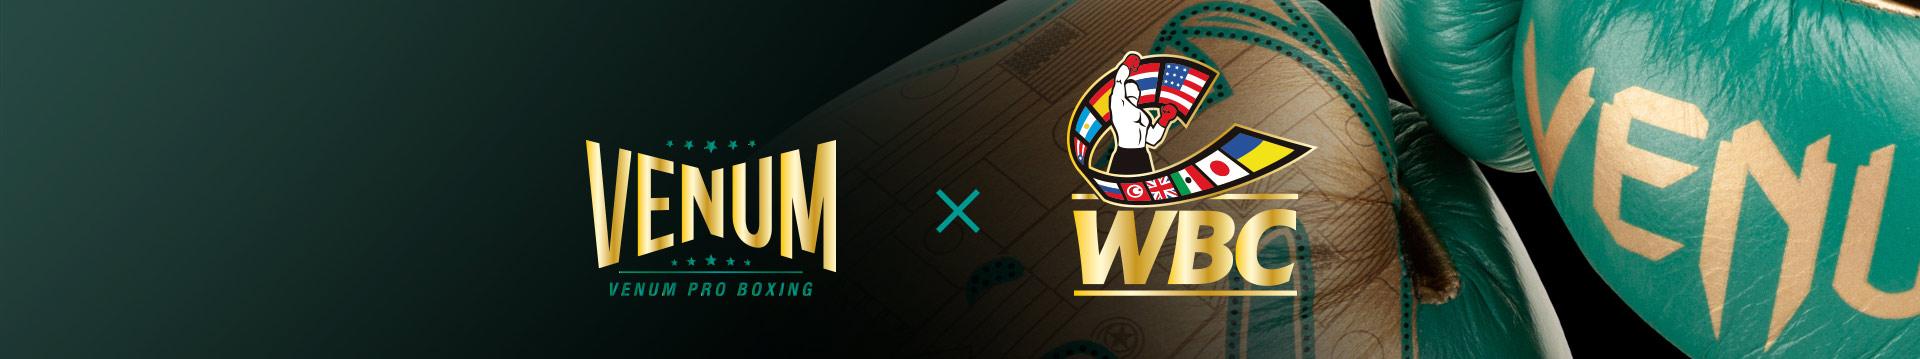 WBC限量系列 - Venum亚洲 - Venum毒液中国官方网站